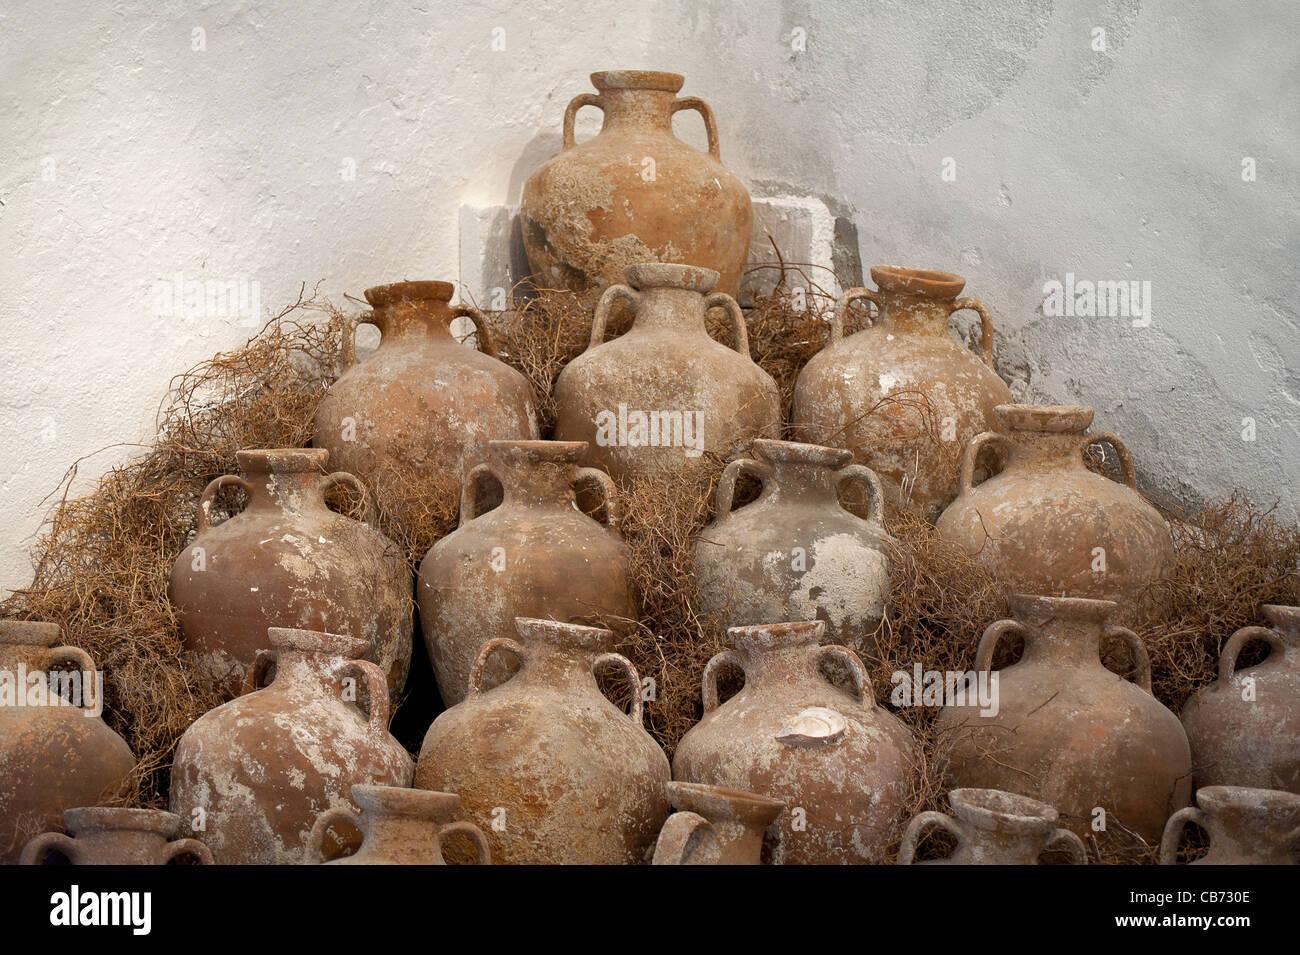 Amphora in Bodrum Underwater Archeology Museum Turkey - Stock Image